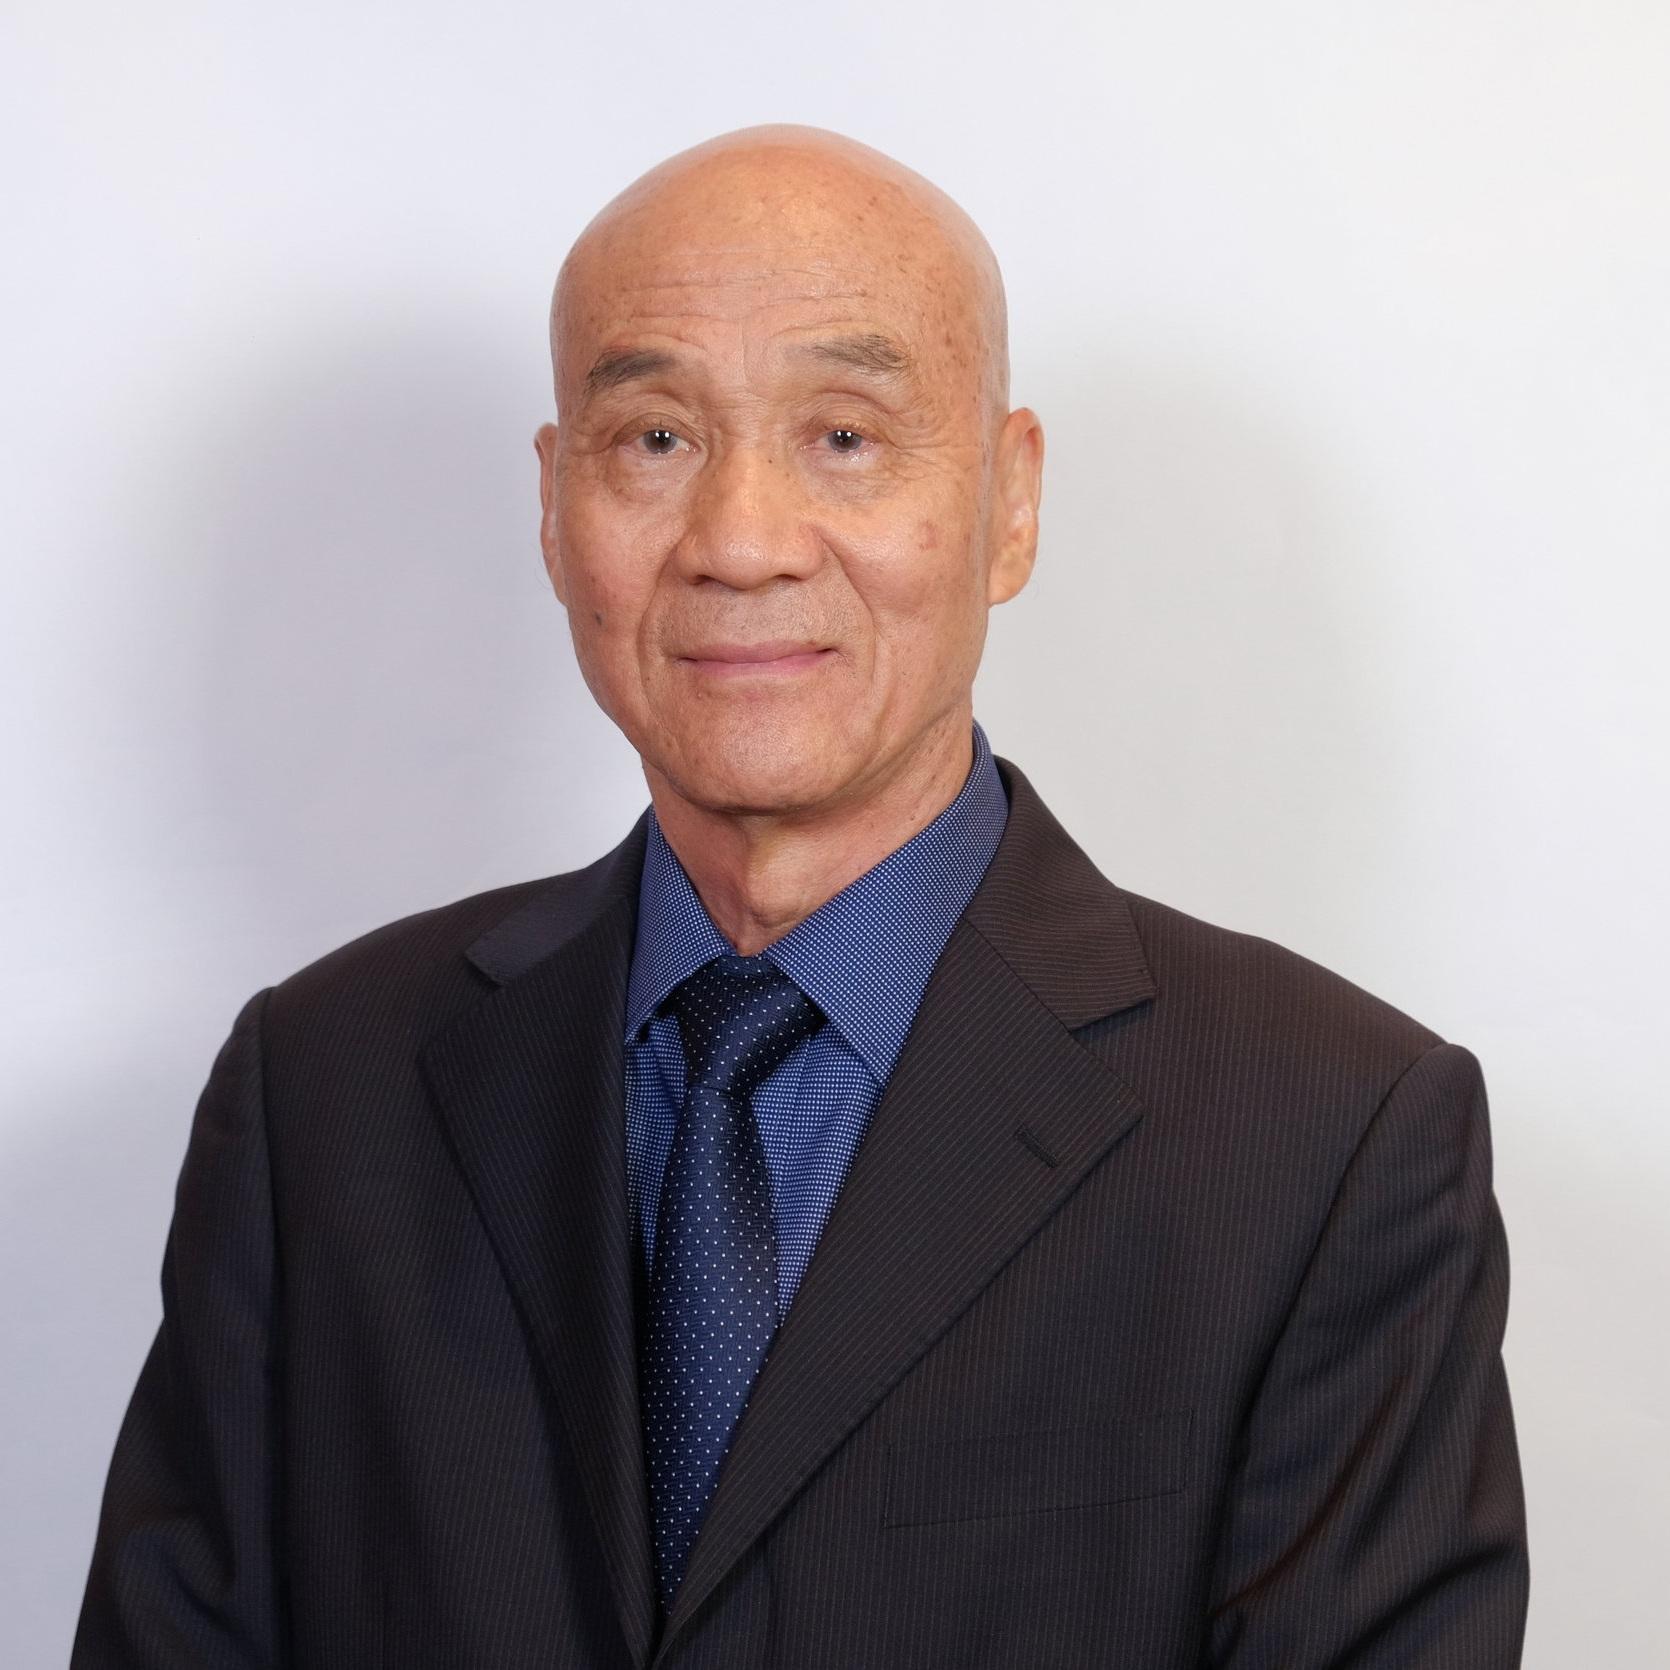 Dr. Ho Leng WoonCHAIRMAN - Chairman - AP Oil International Limited, Singapore